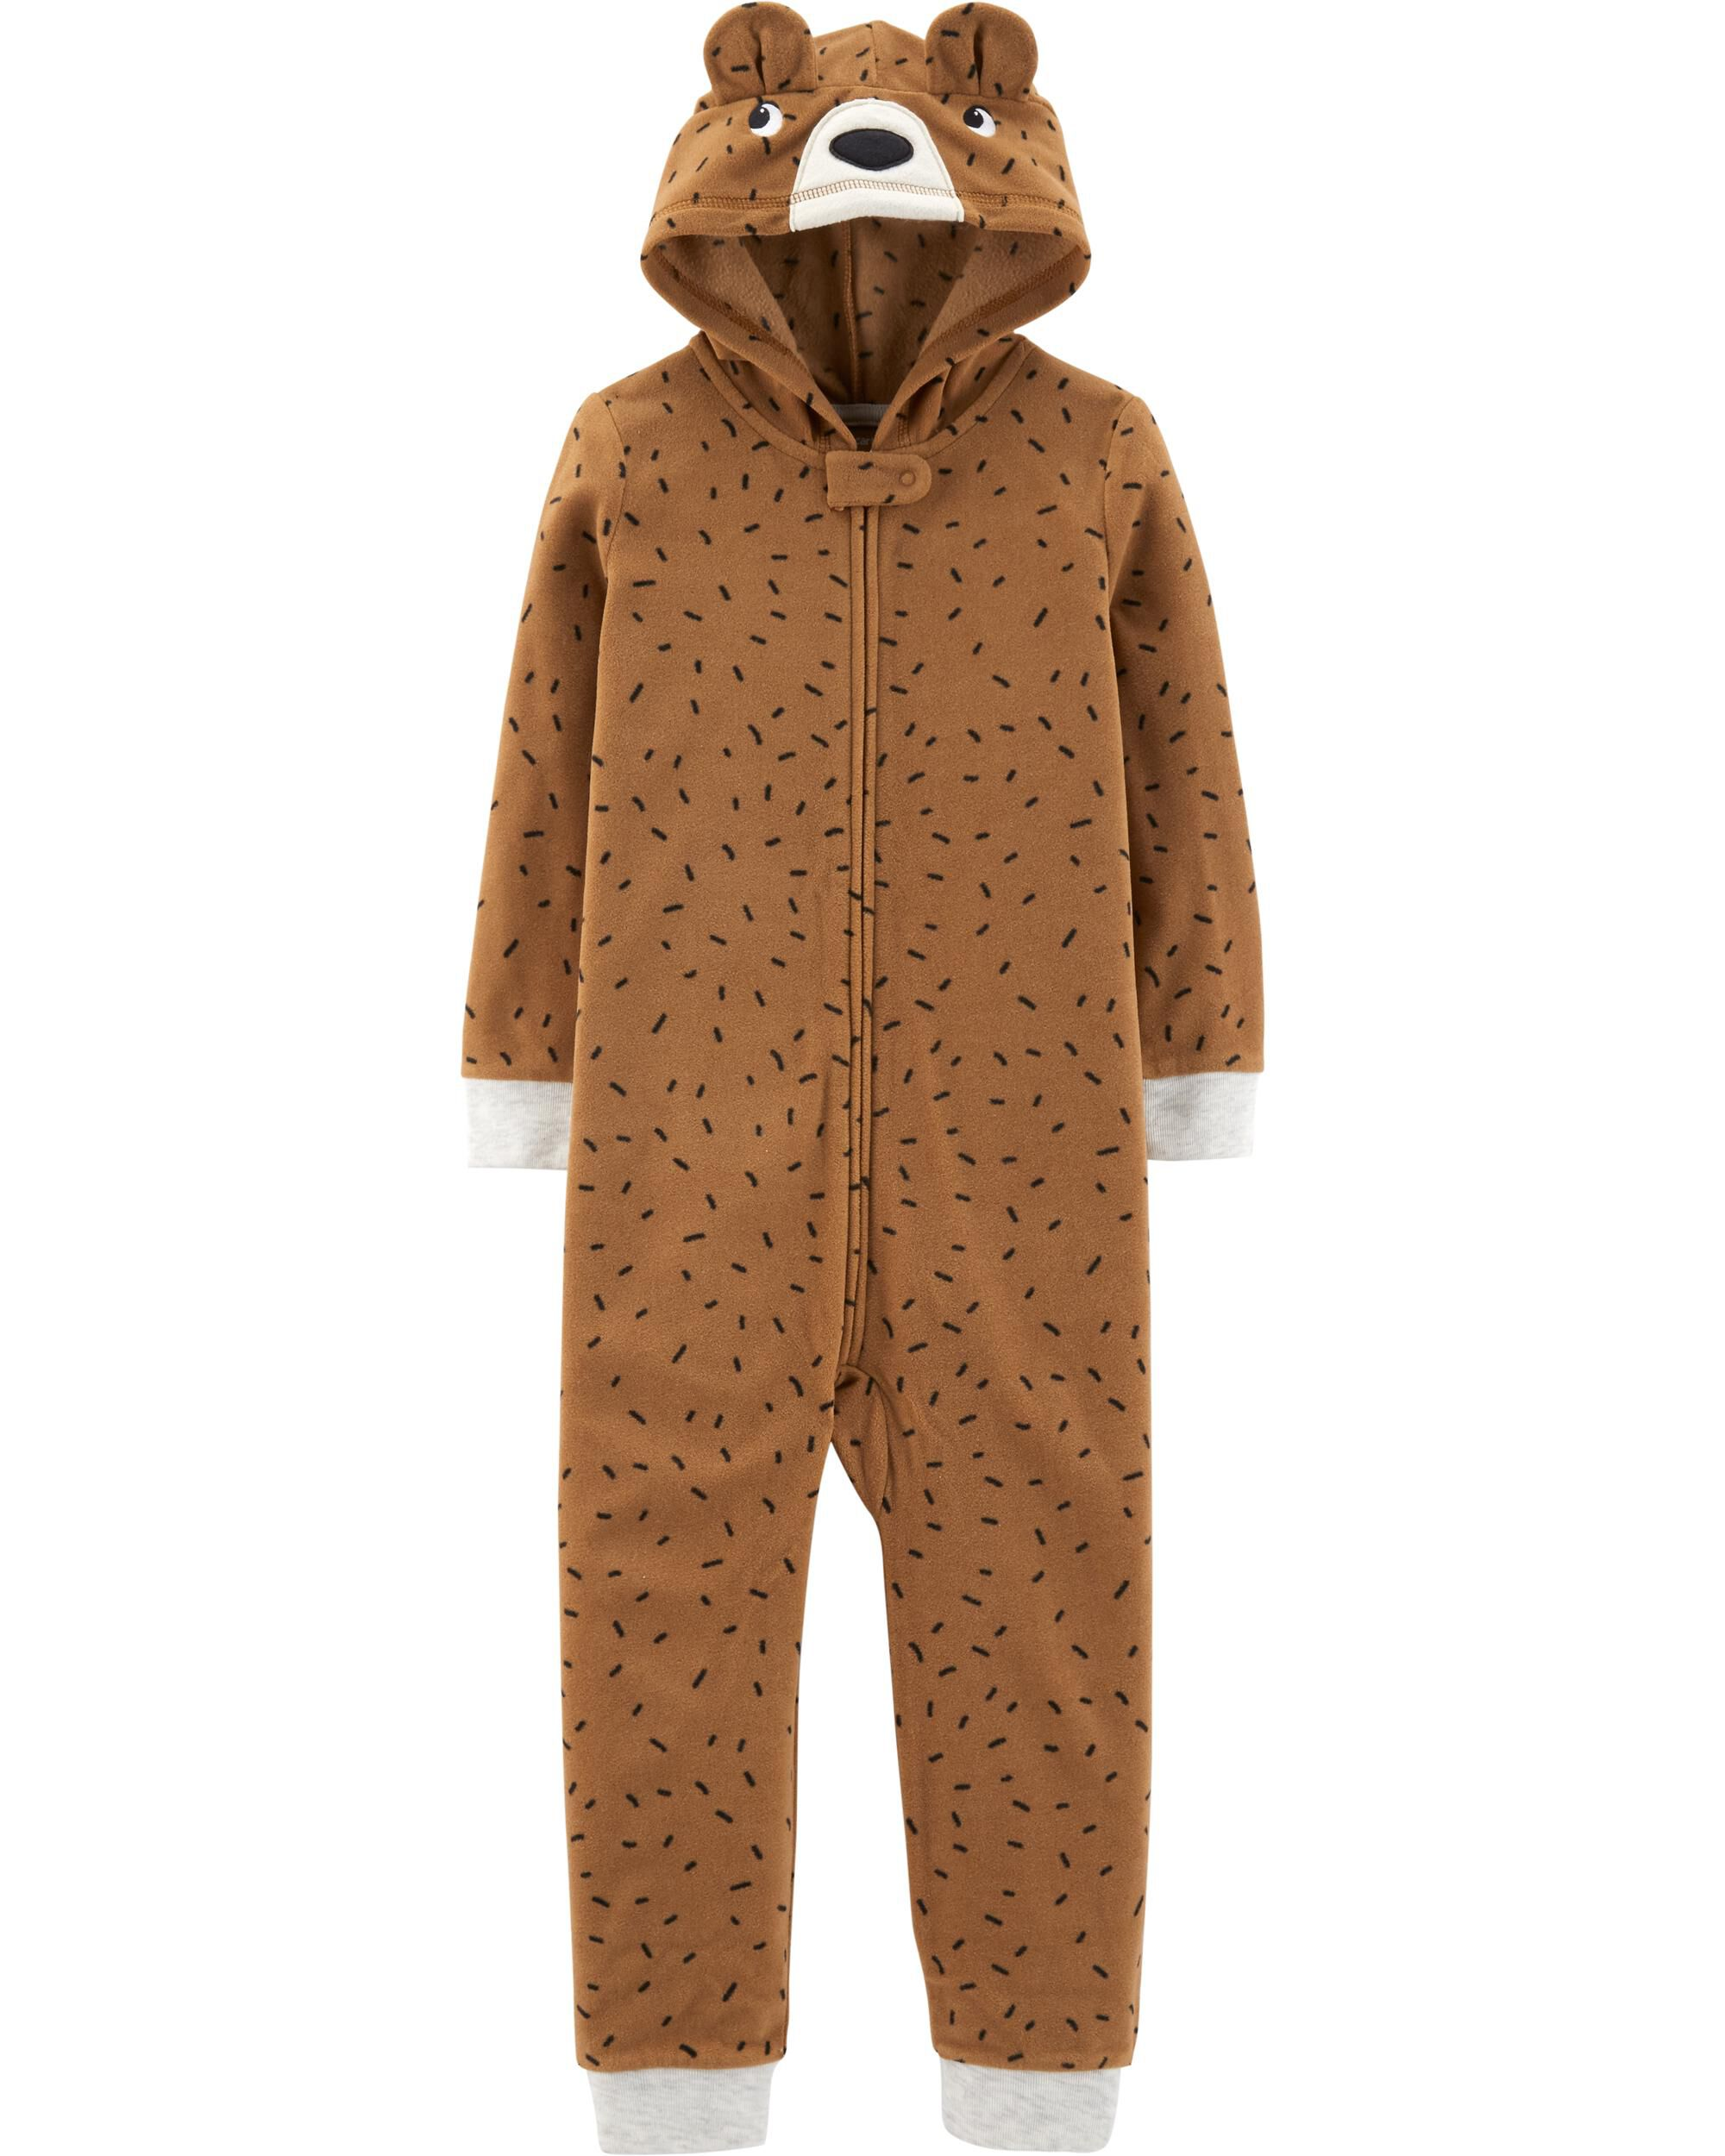 c2456b295 1-Piece Bear Hooded Fleece Footless PJs